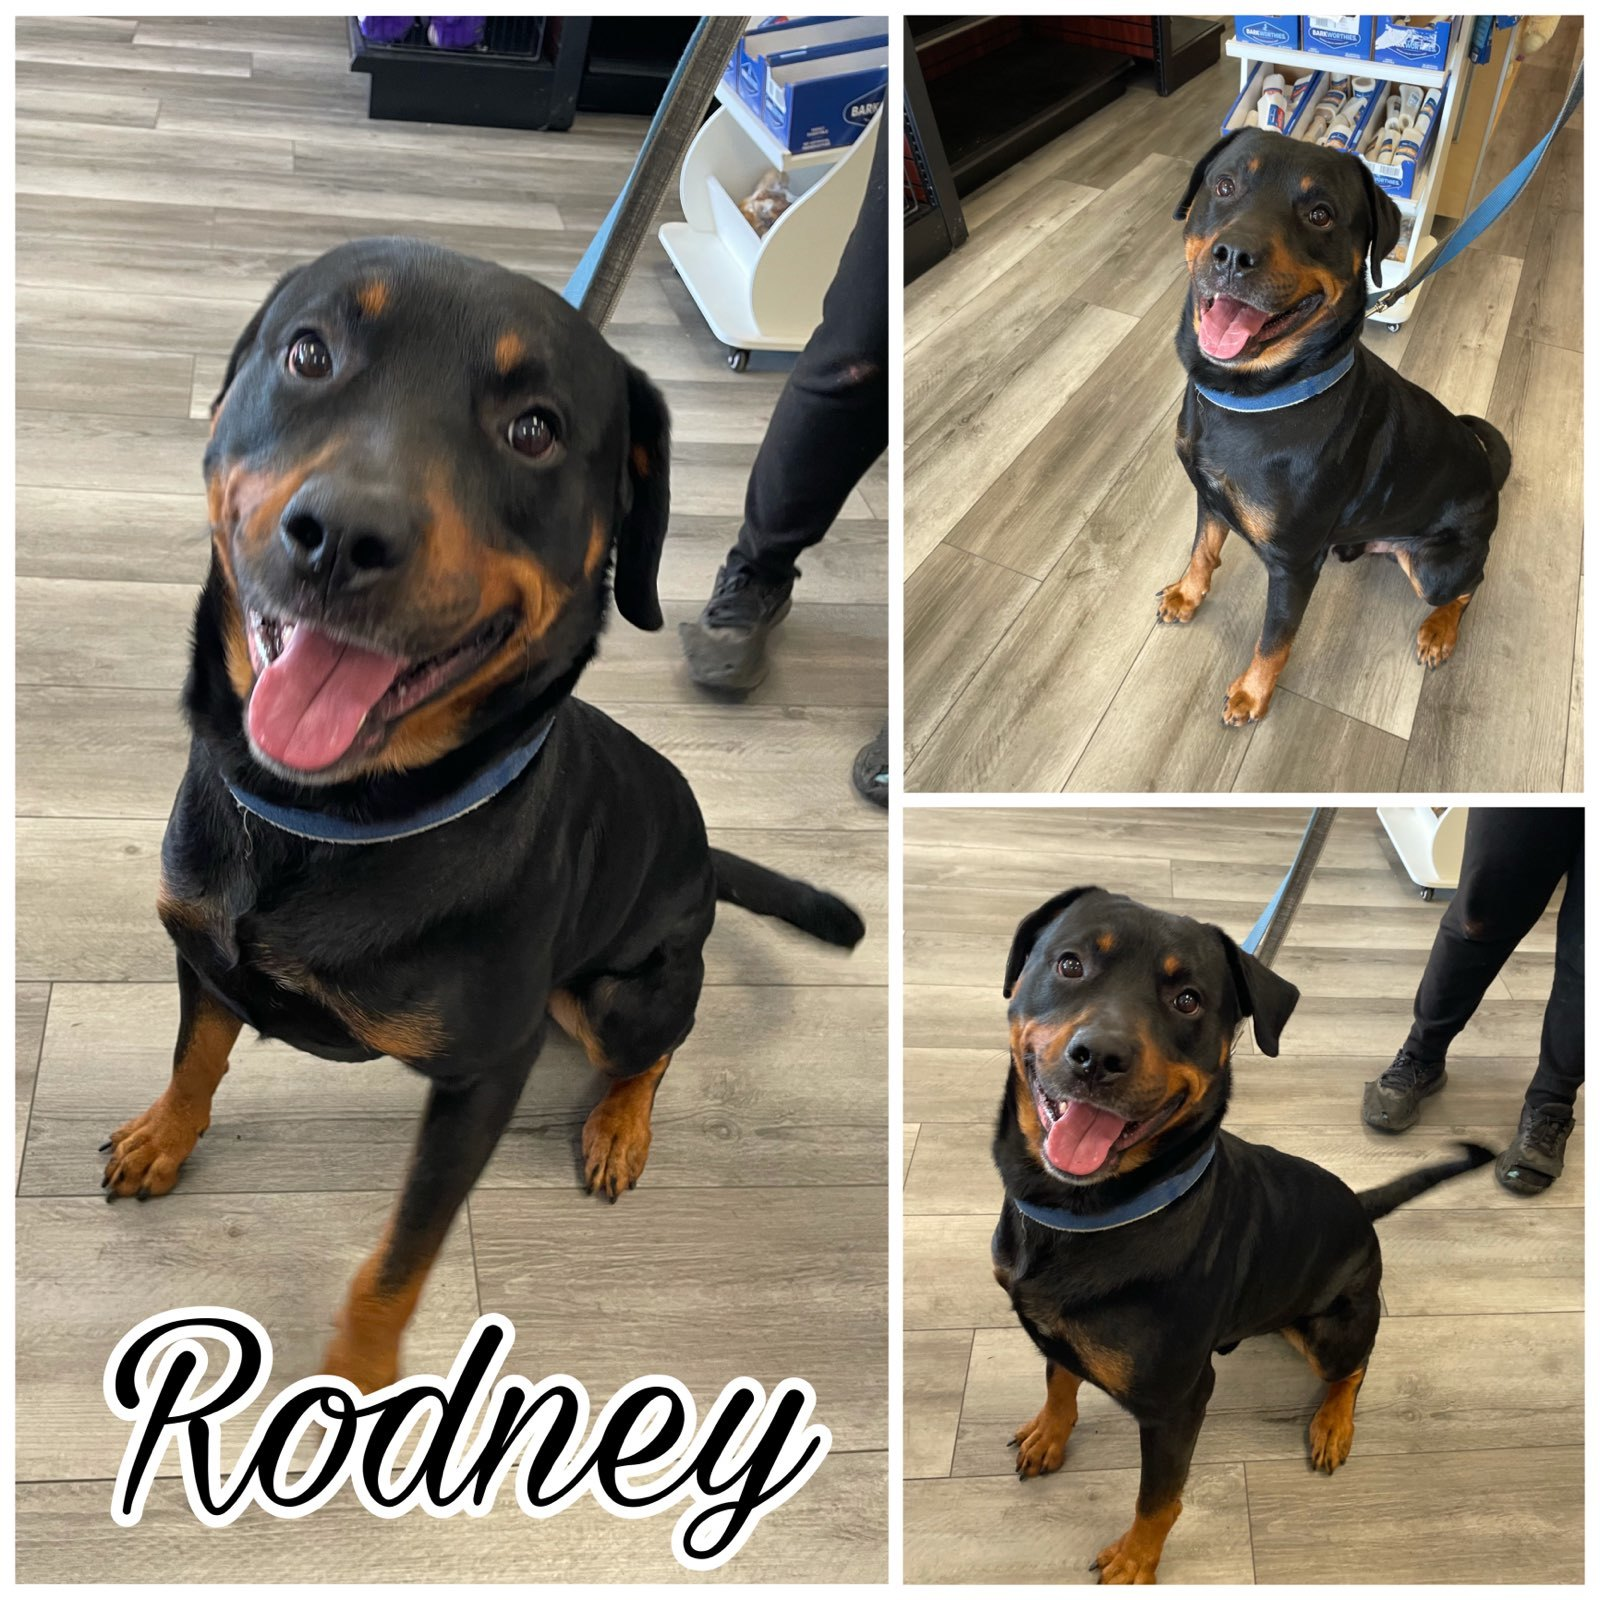 Rodney detail page